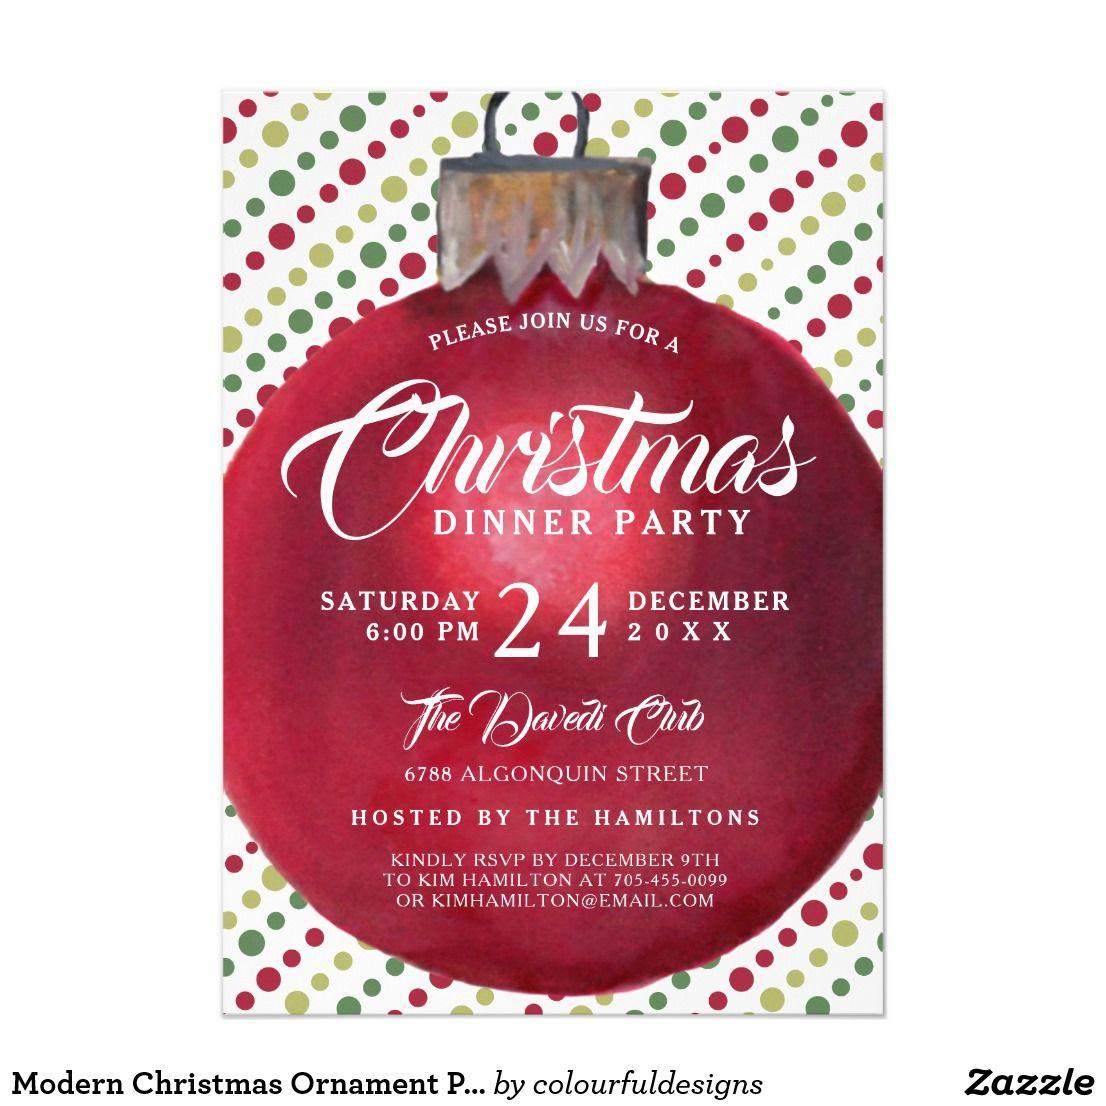 Modern Christmas Ornament Party Invitation   Modern christmas ...